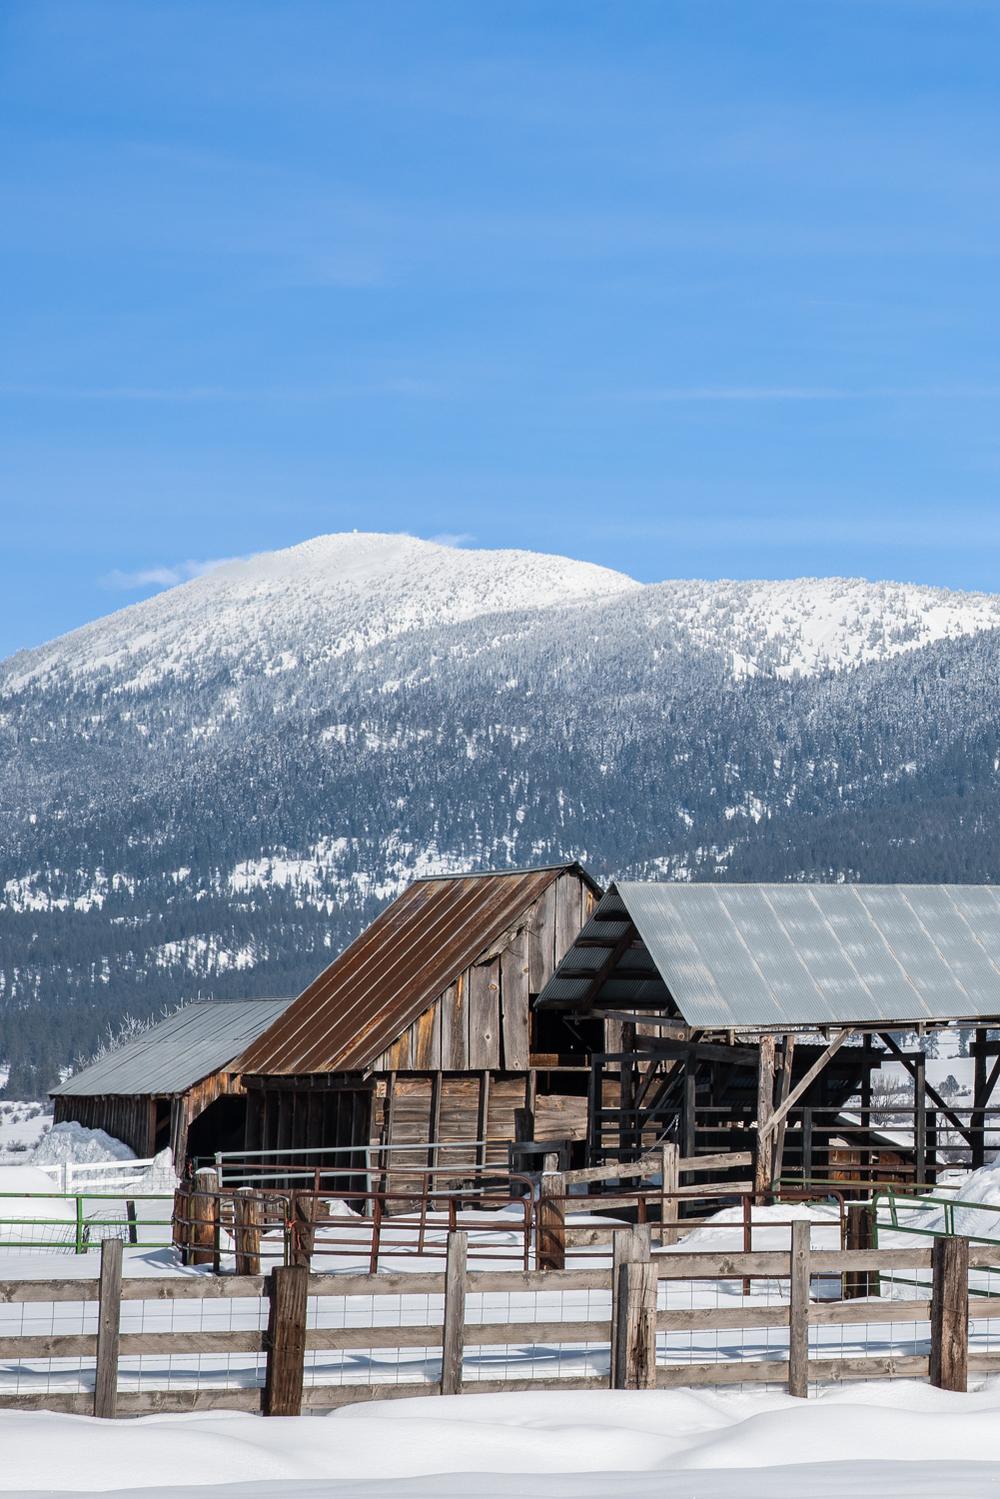 Corral Buildings in Winter